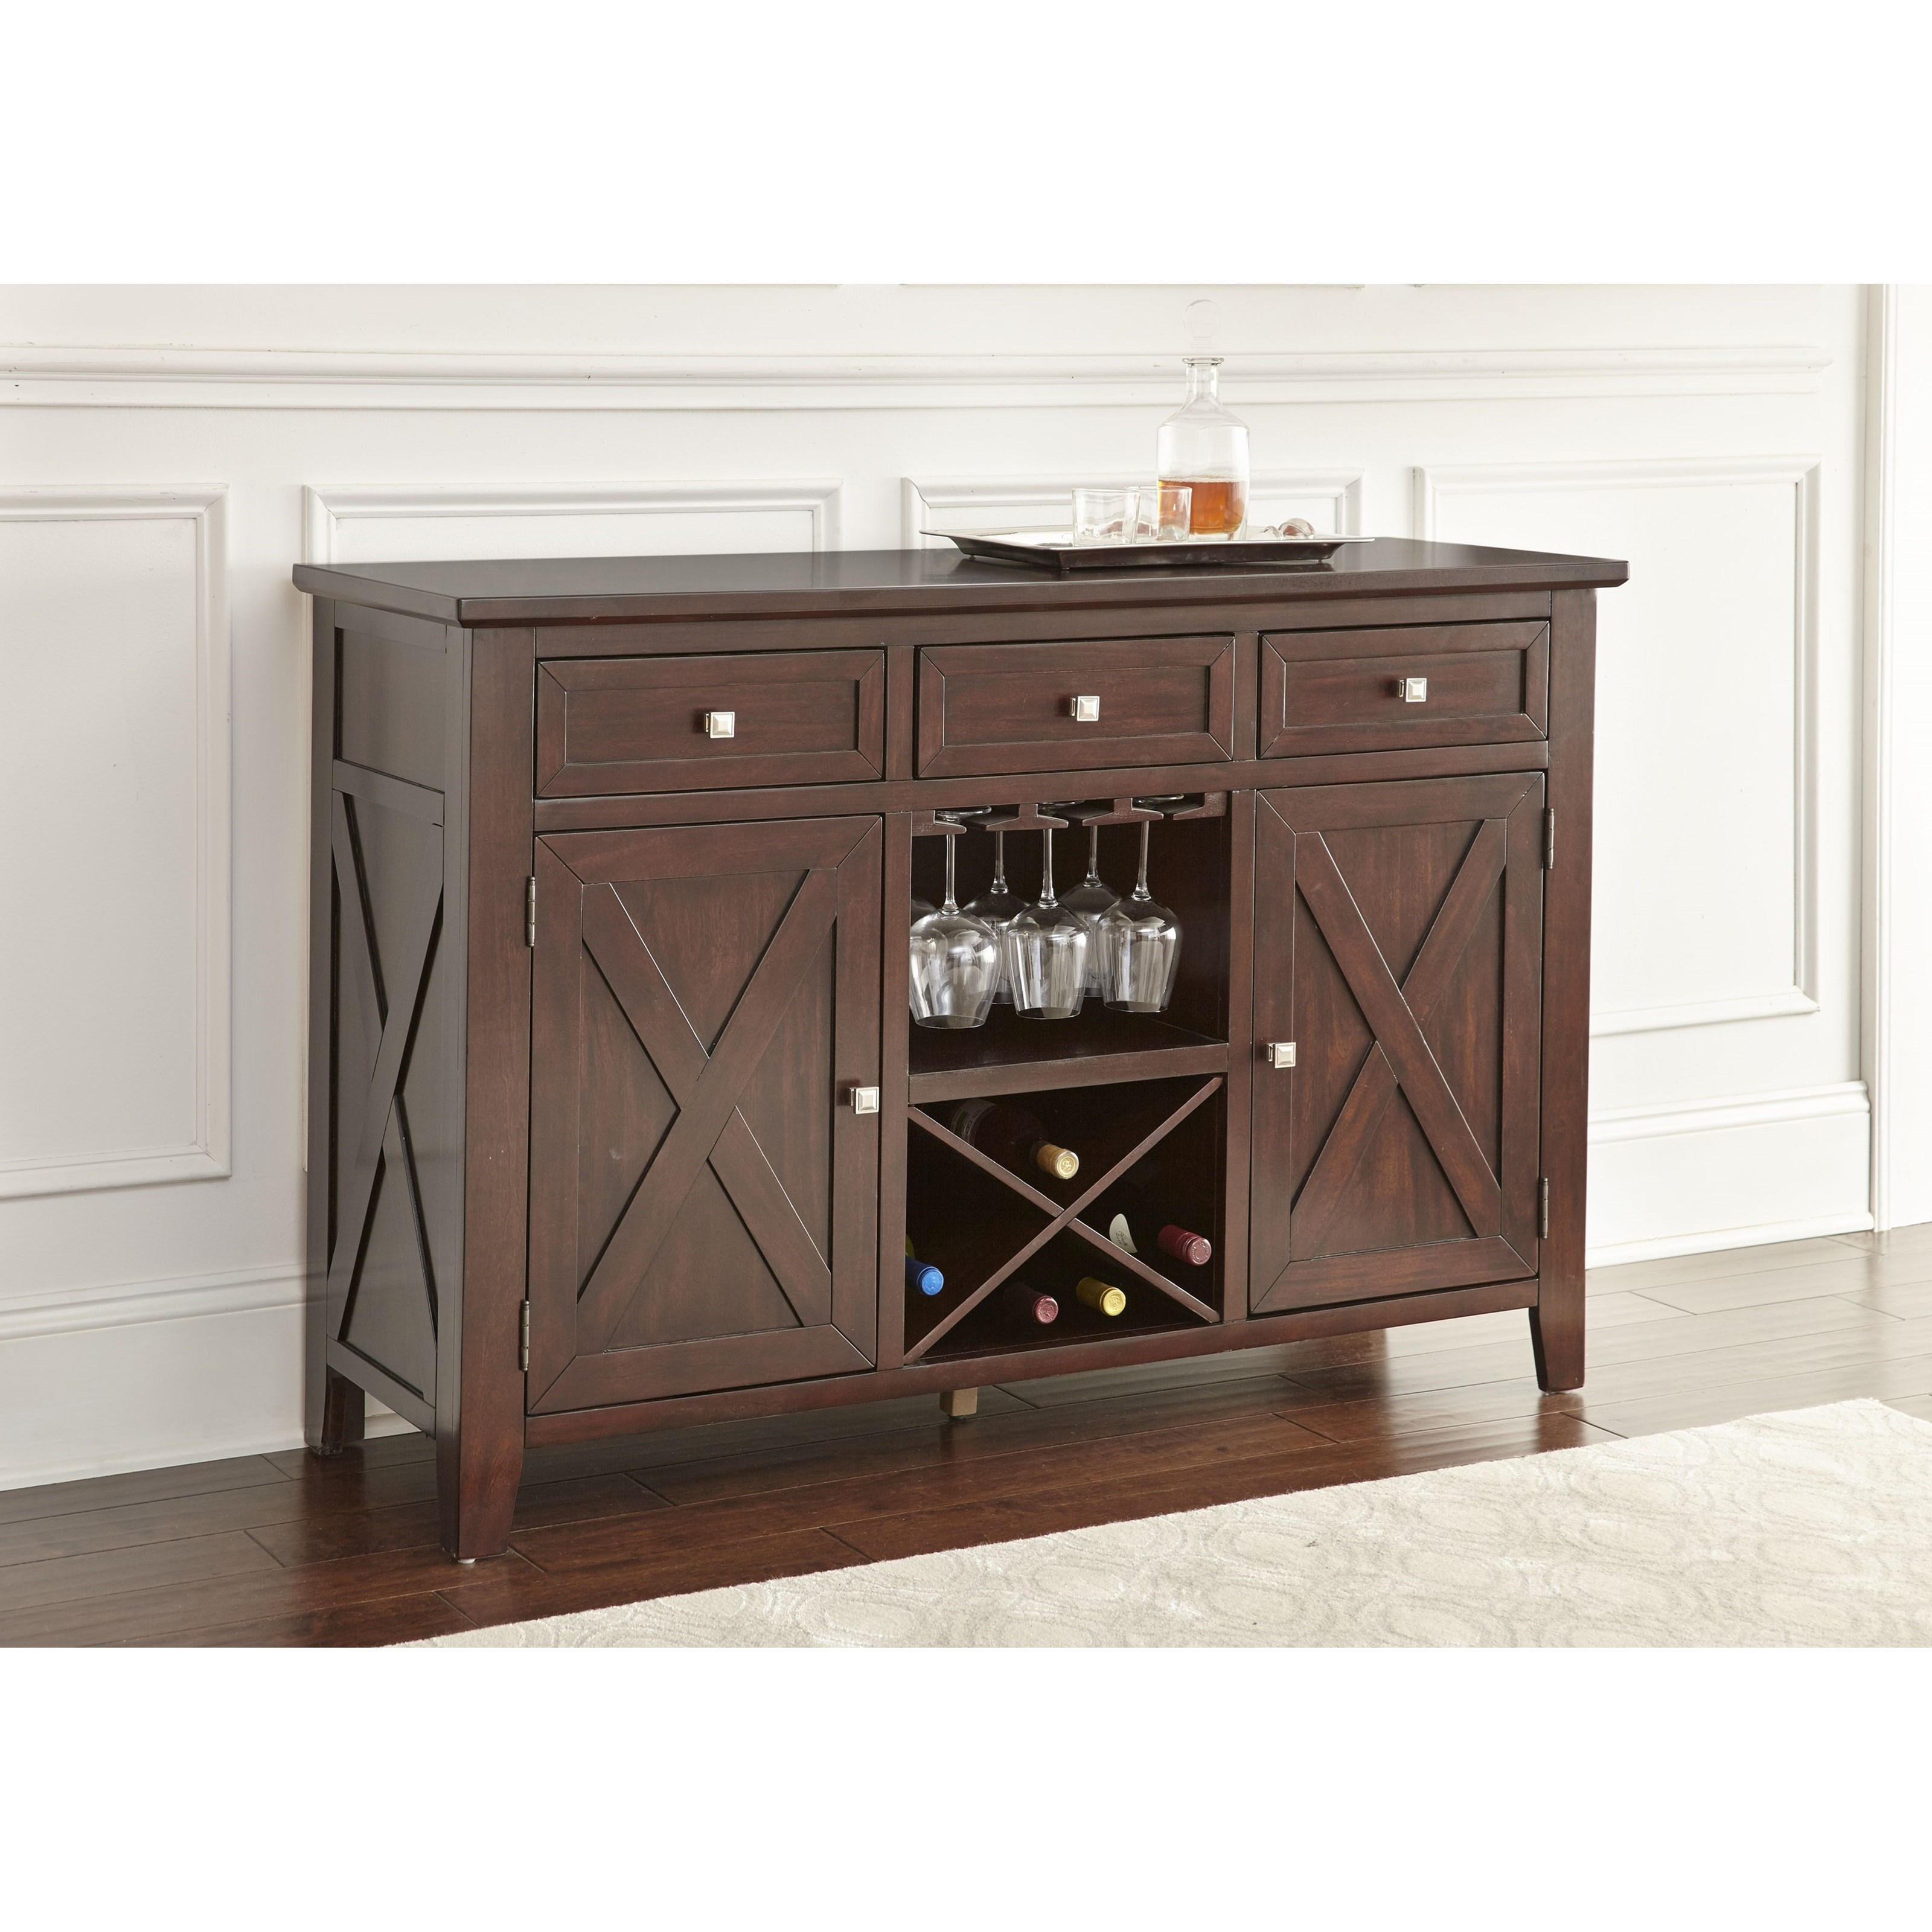 Adrian Server by Vendor 3985 at Becker Furniture